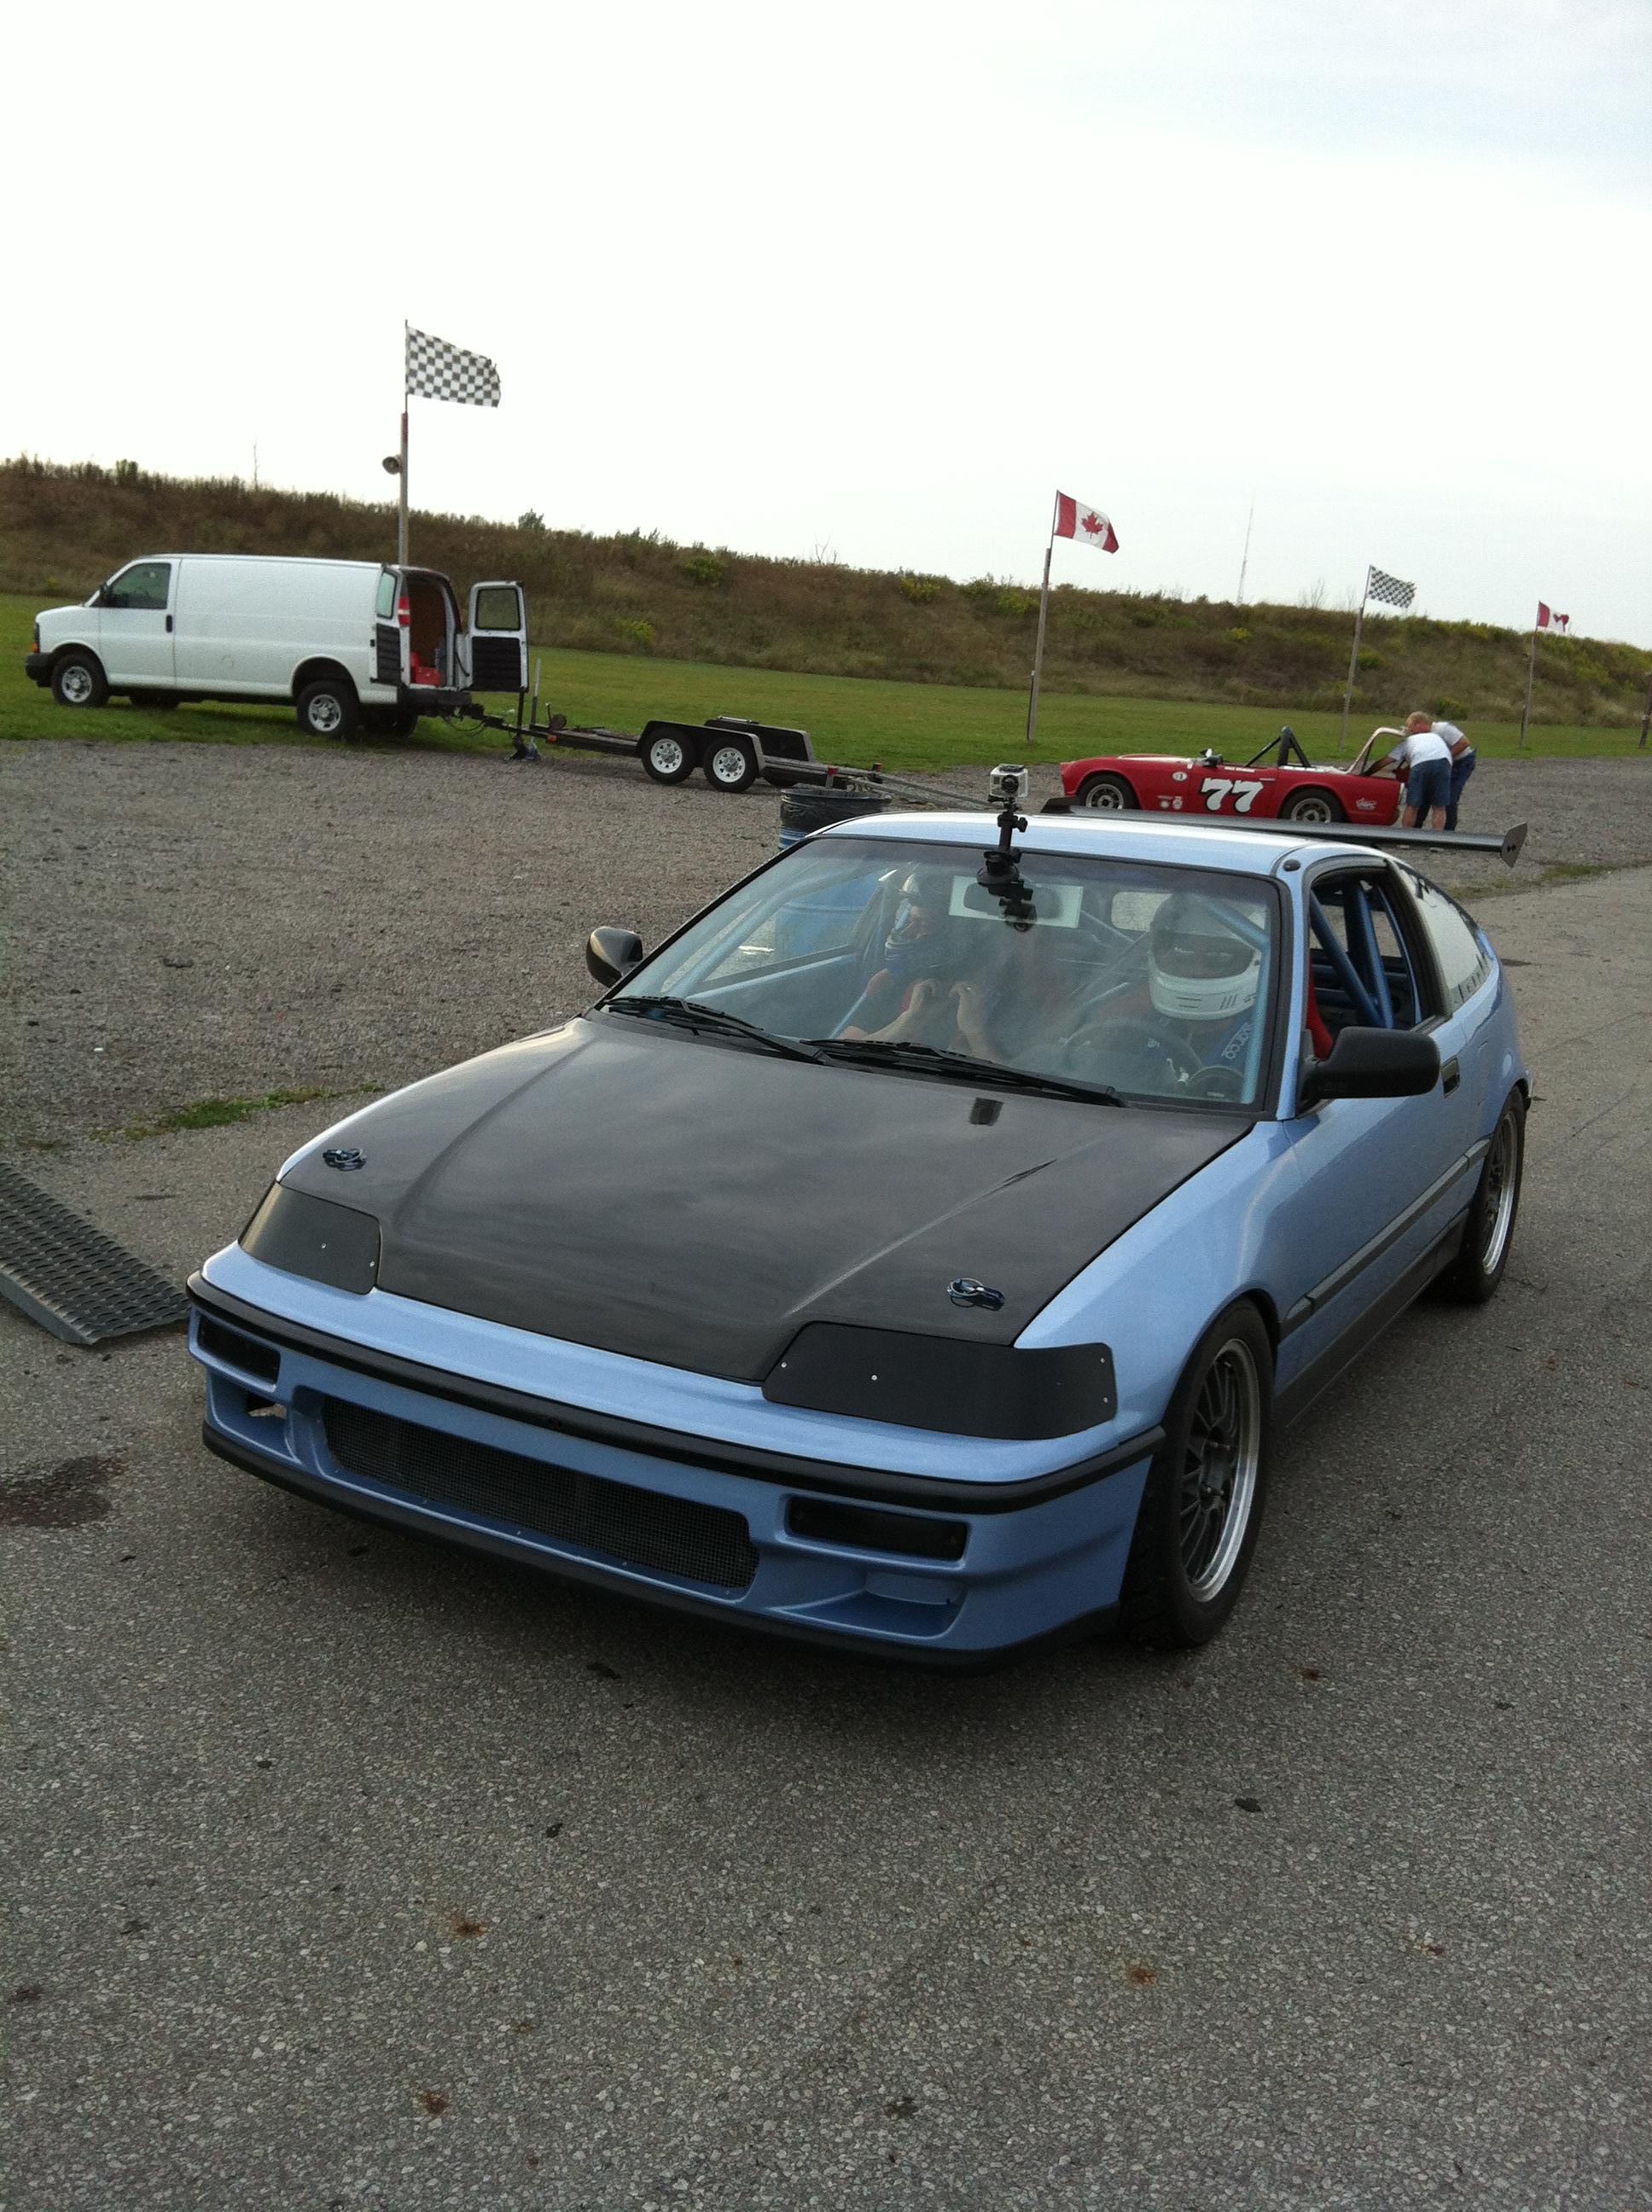 Used Trucks Maine >> 1989 Honda CRX Race/Track Car & Trailer Package For Sale in Brampton - $10000